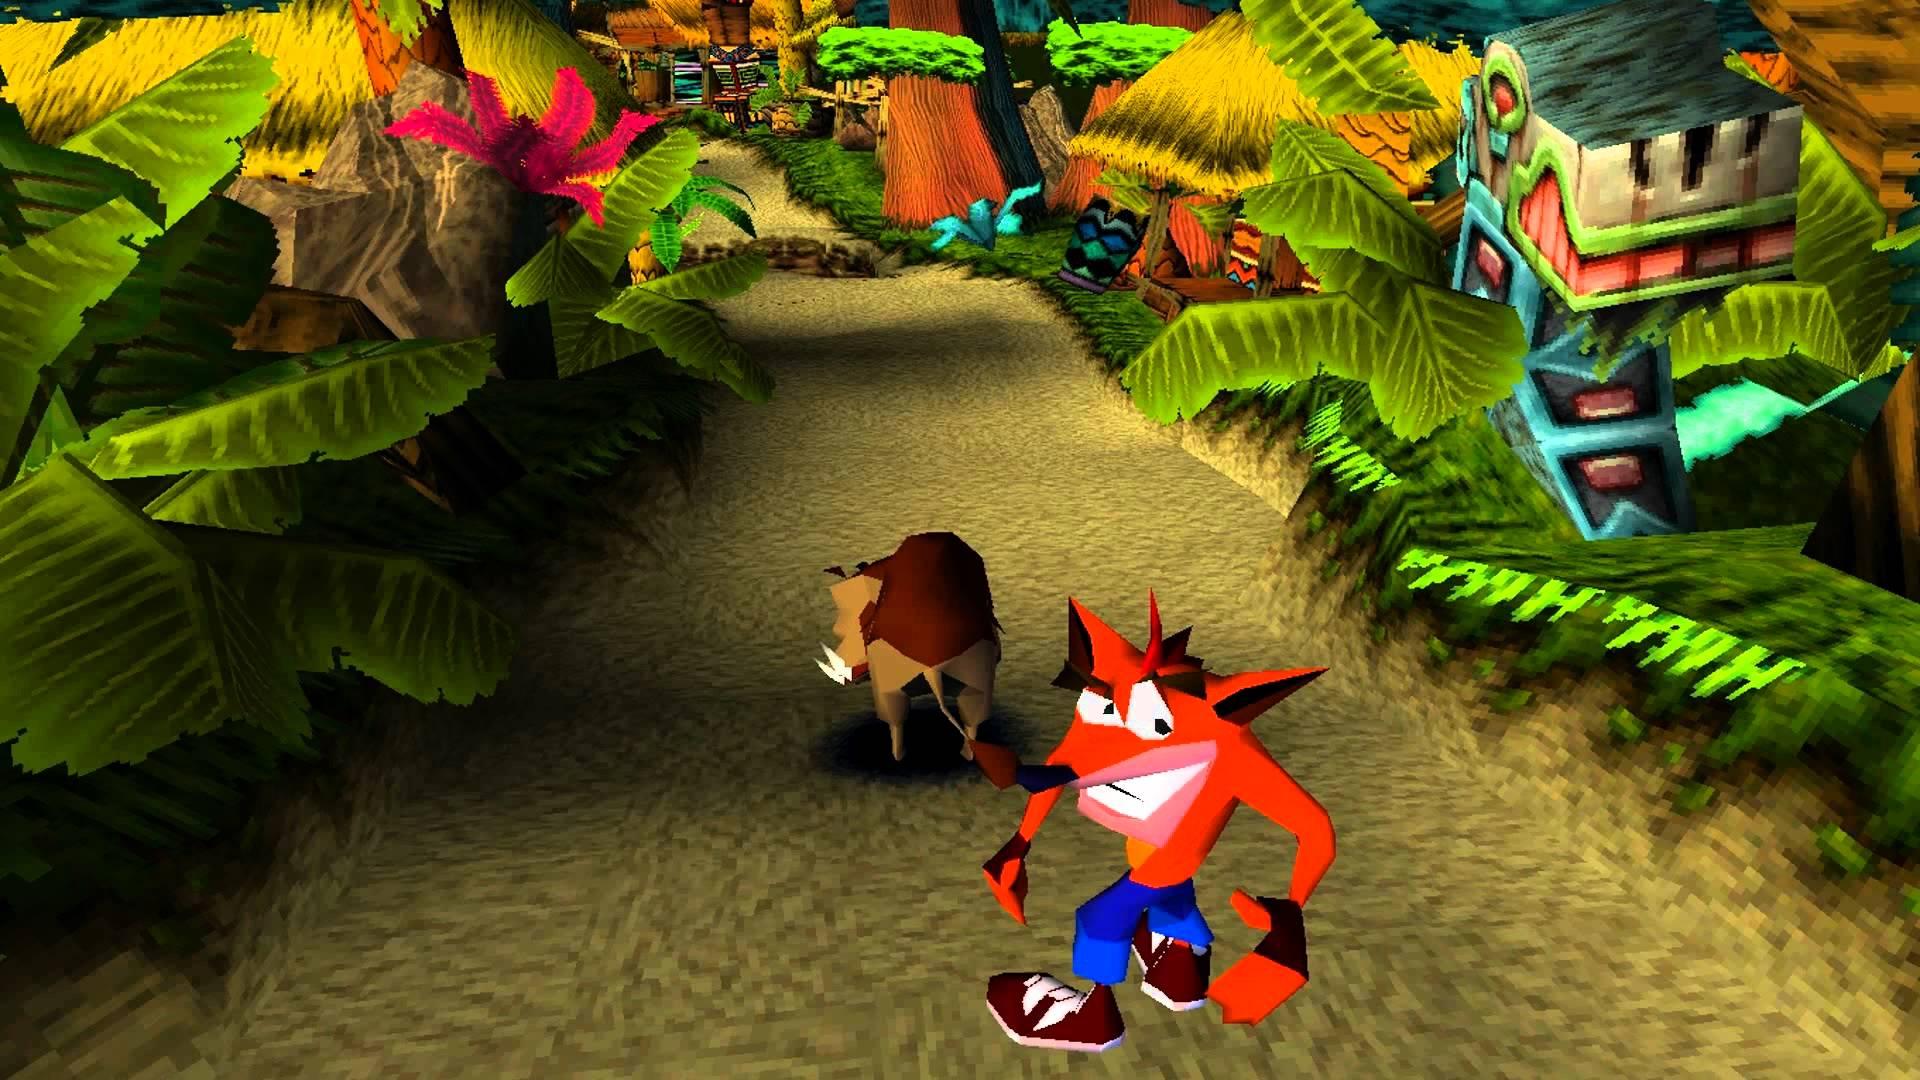 nostalgic news crash bandicoot was released 20 years ago today